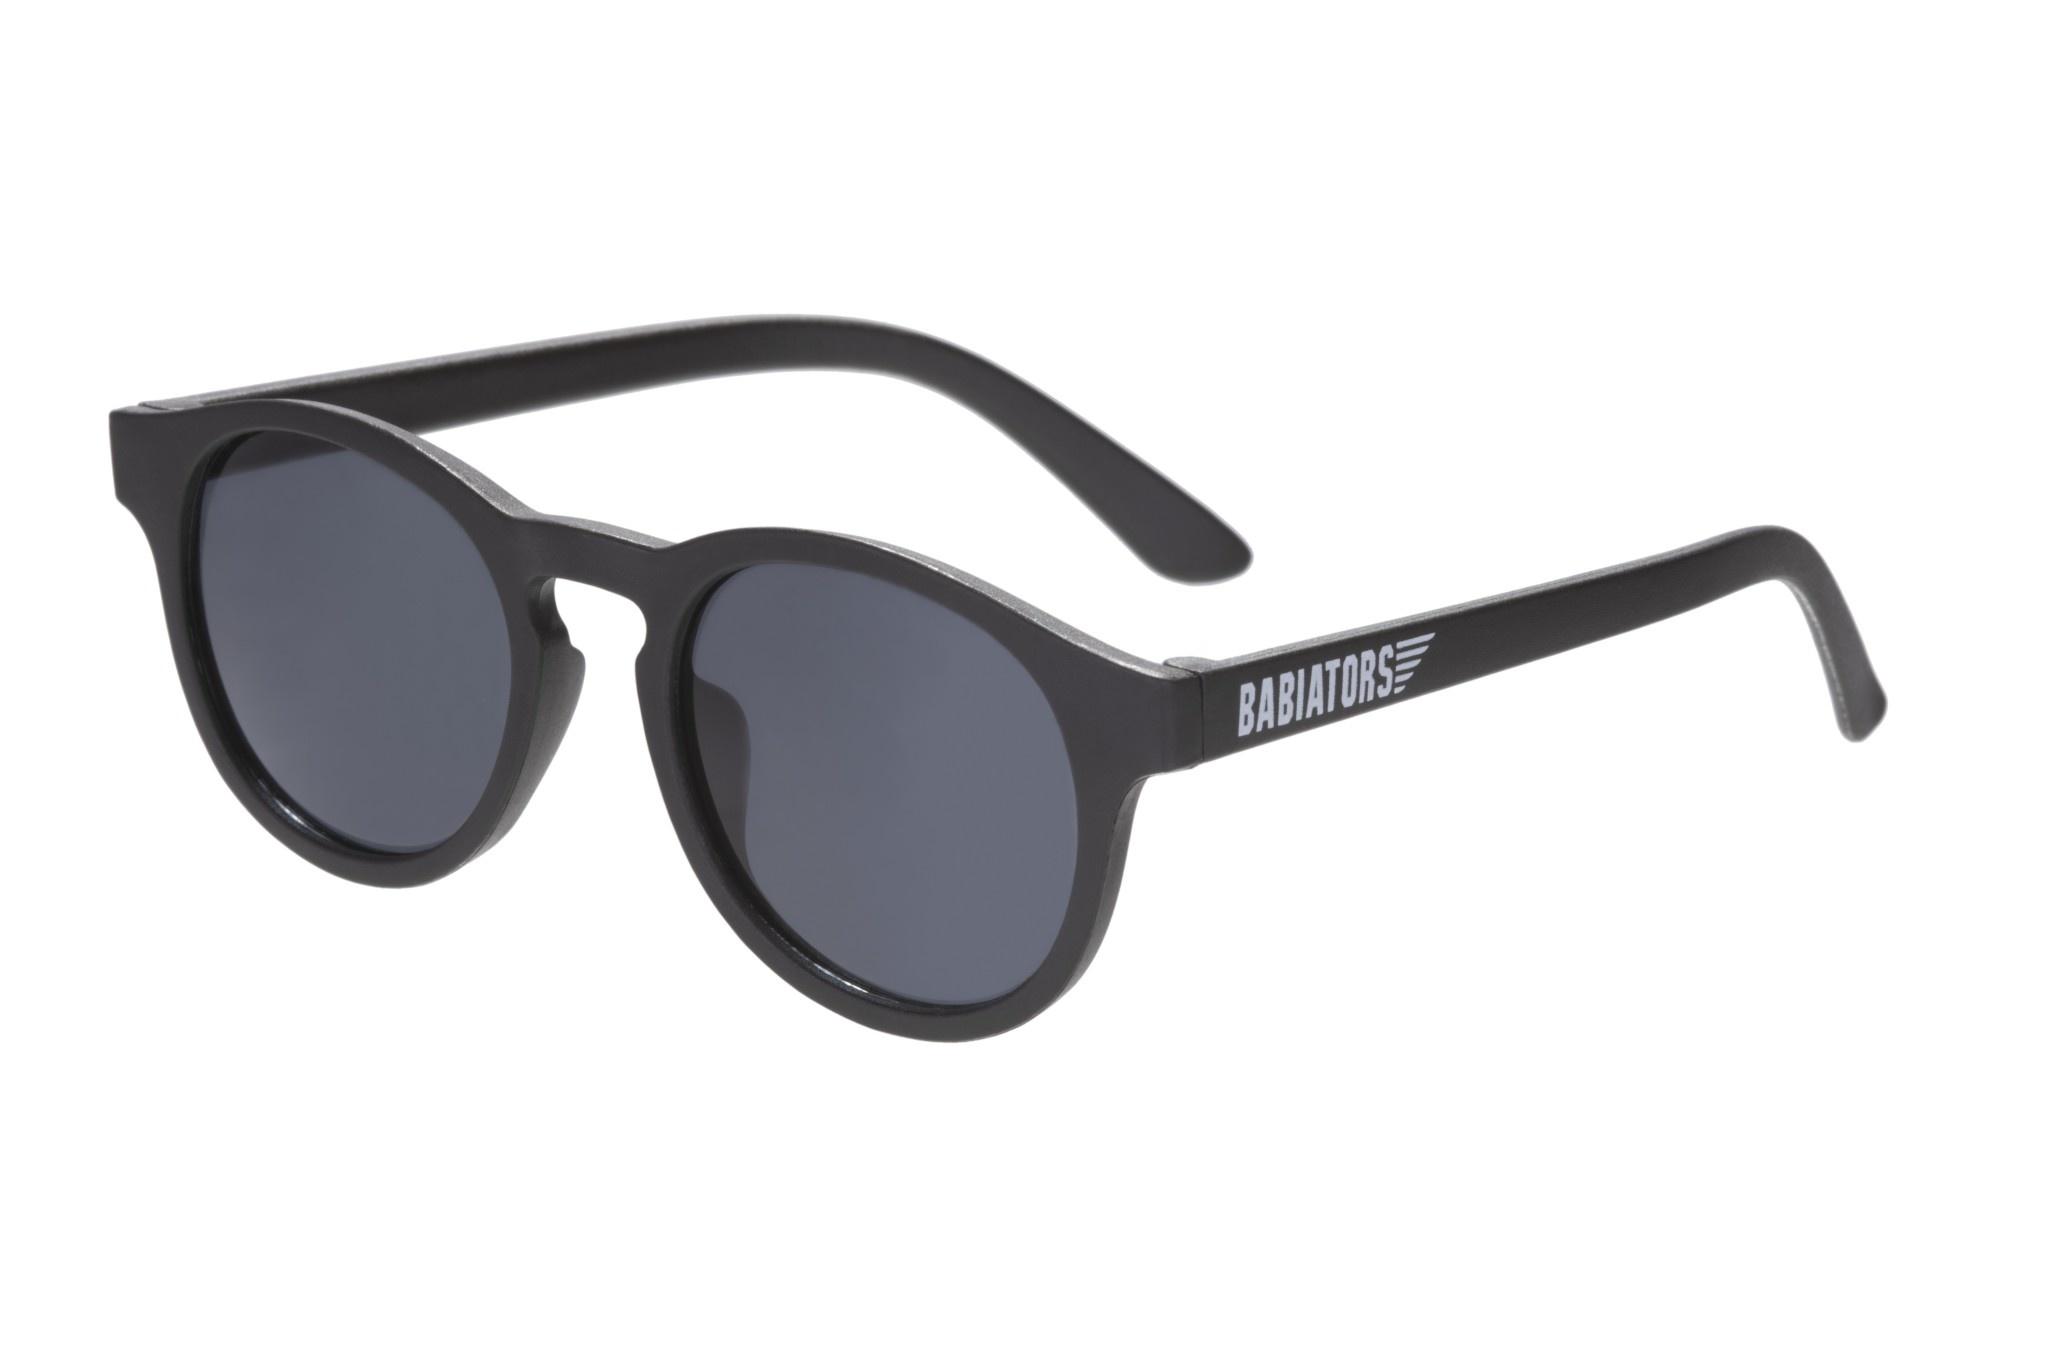 Keyhole Style Sunglasses - Black Ops Black